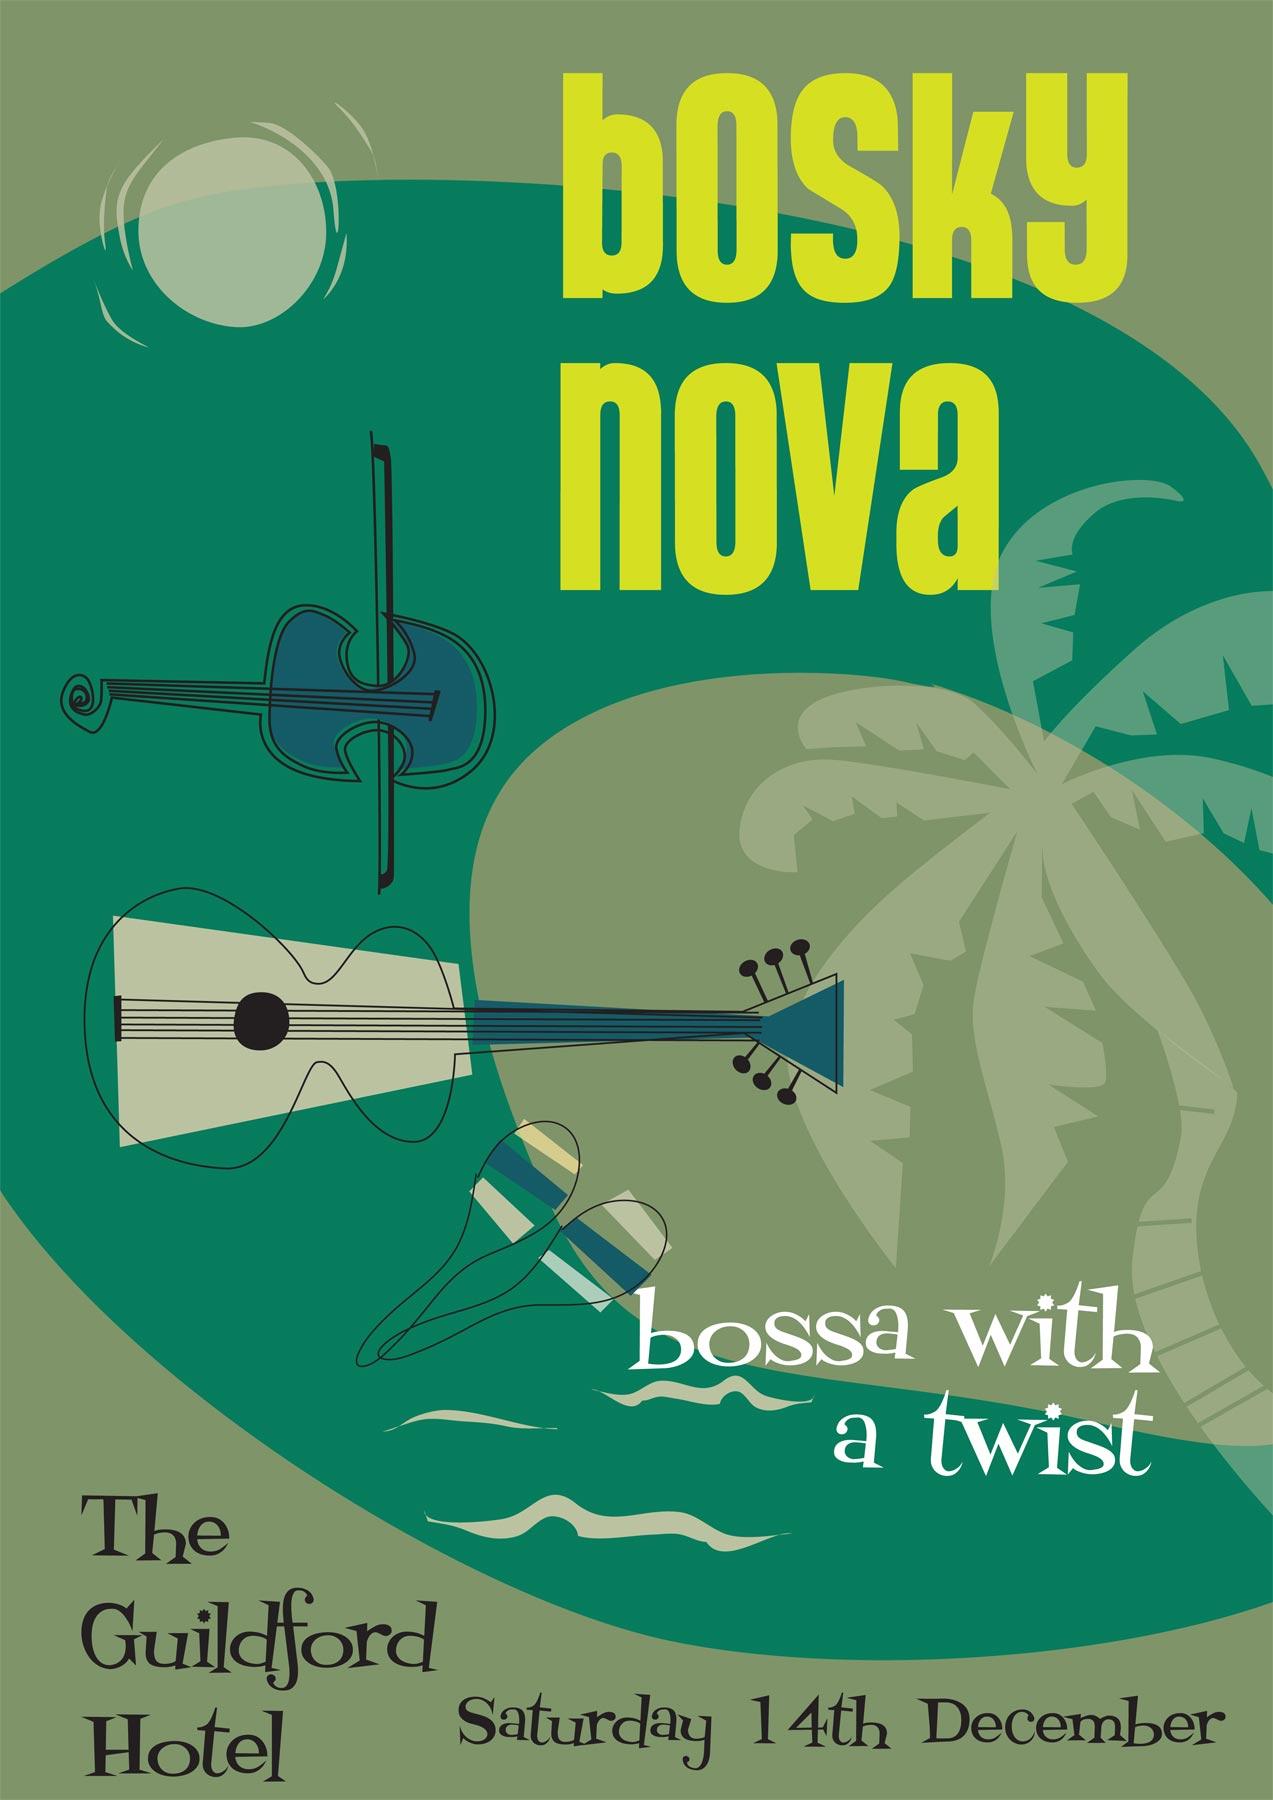 bosky nova poster graphic design